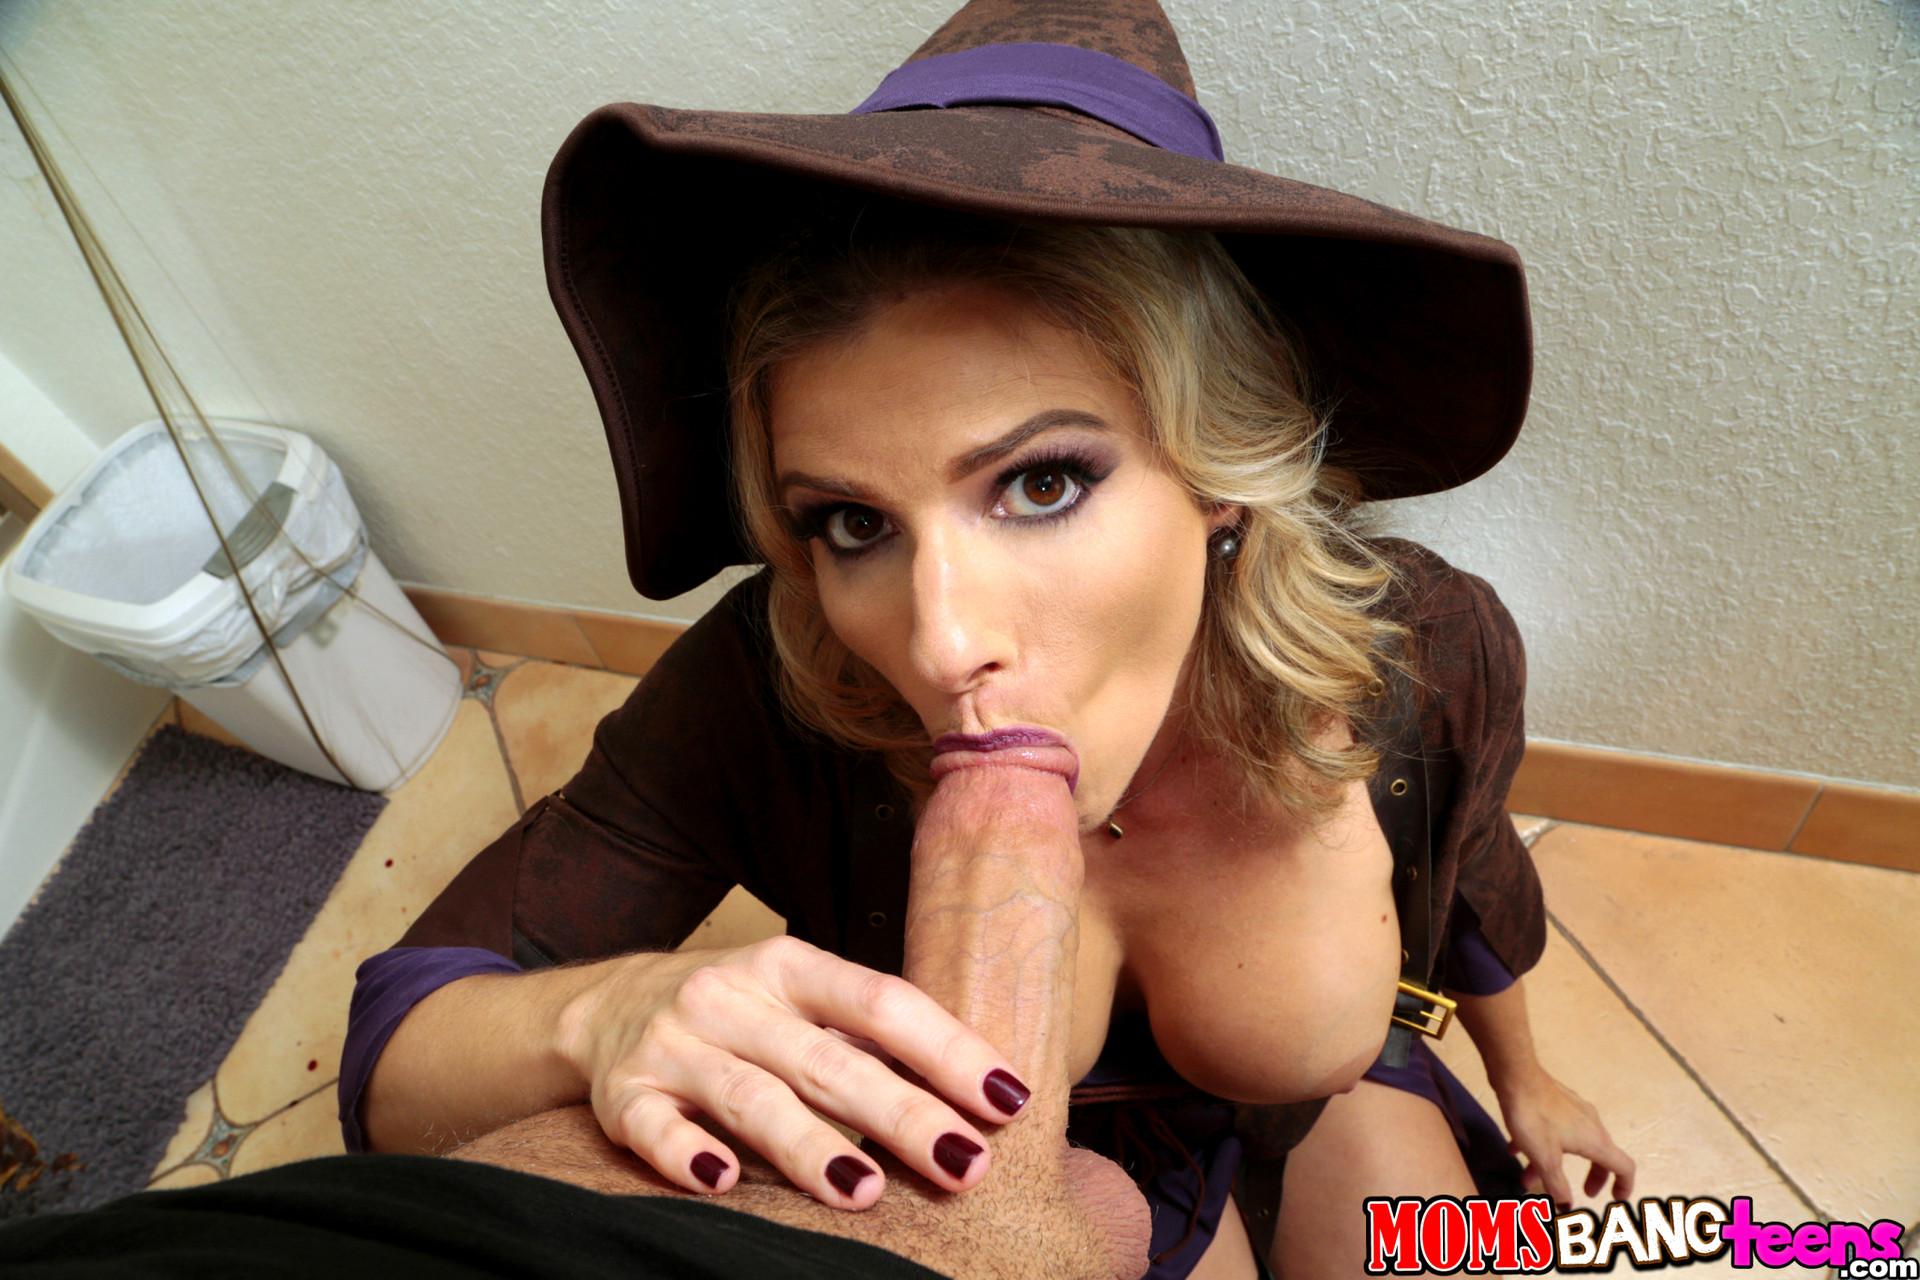 Brooke banner blowjob